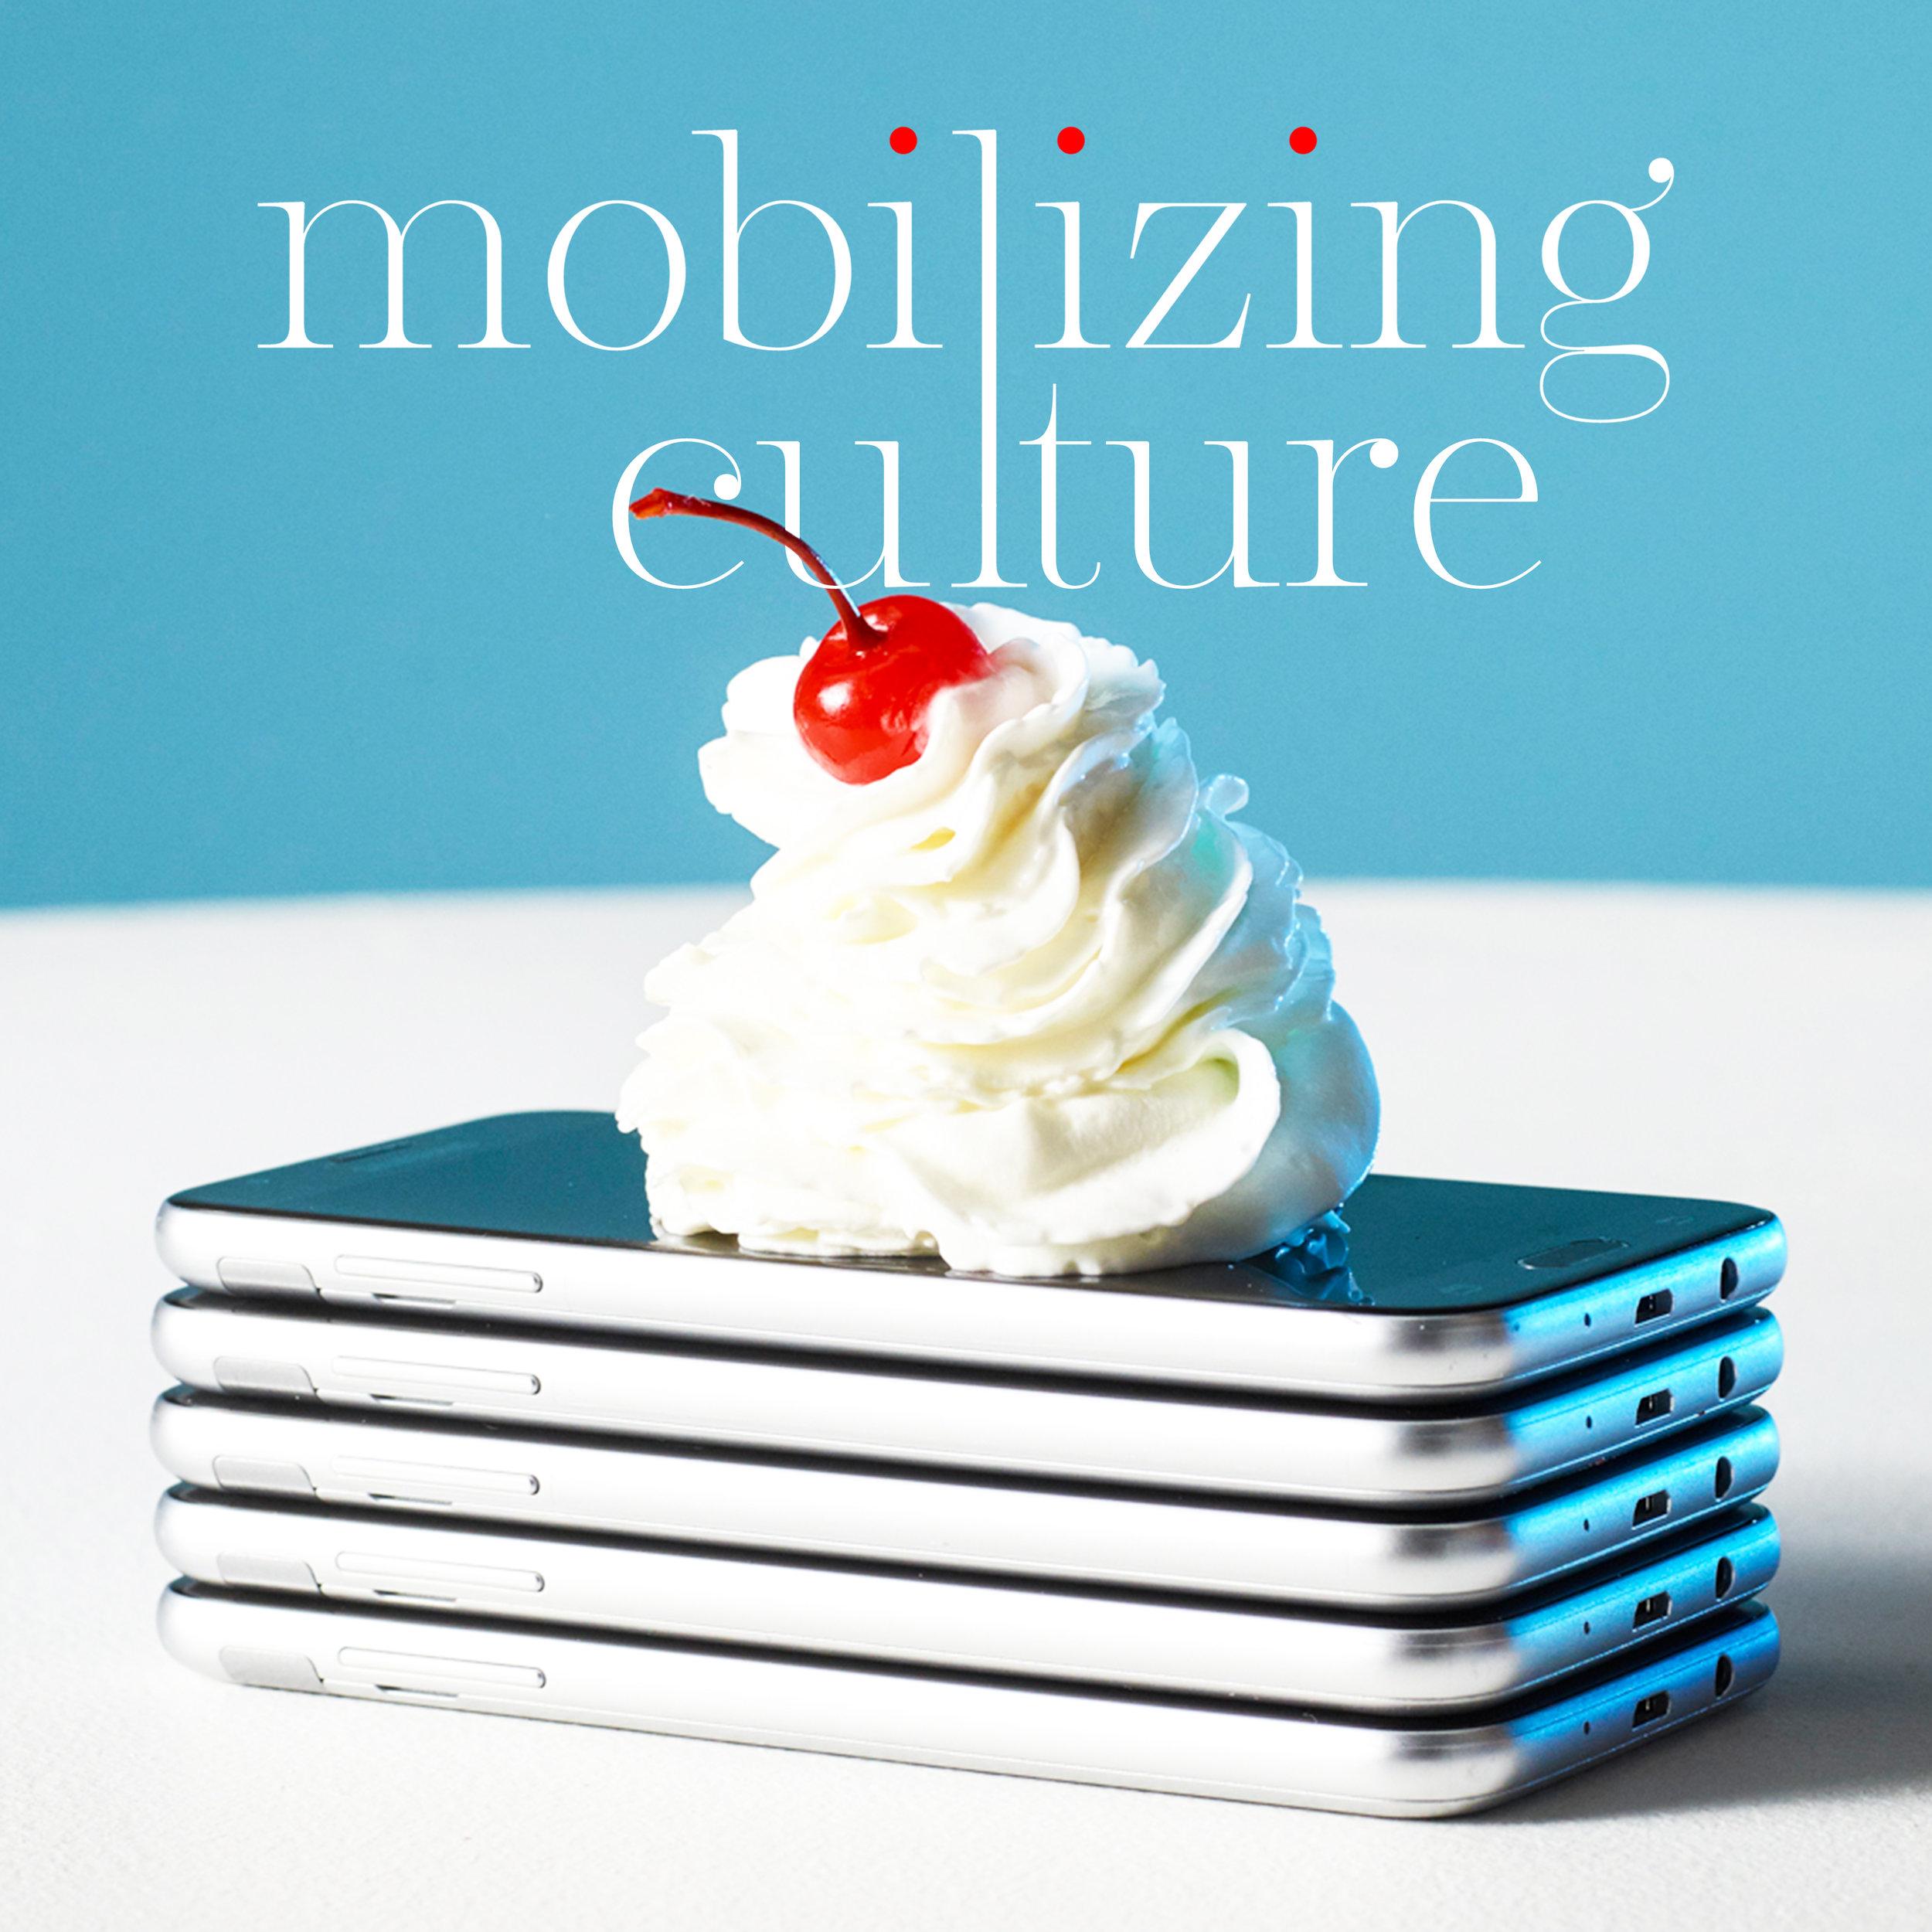 Mobilizingculture_podcast_image_2.jpg